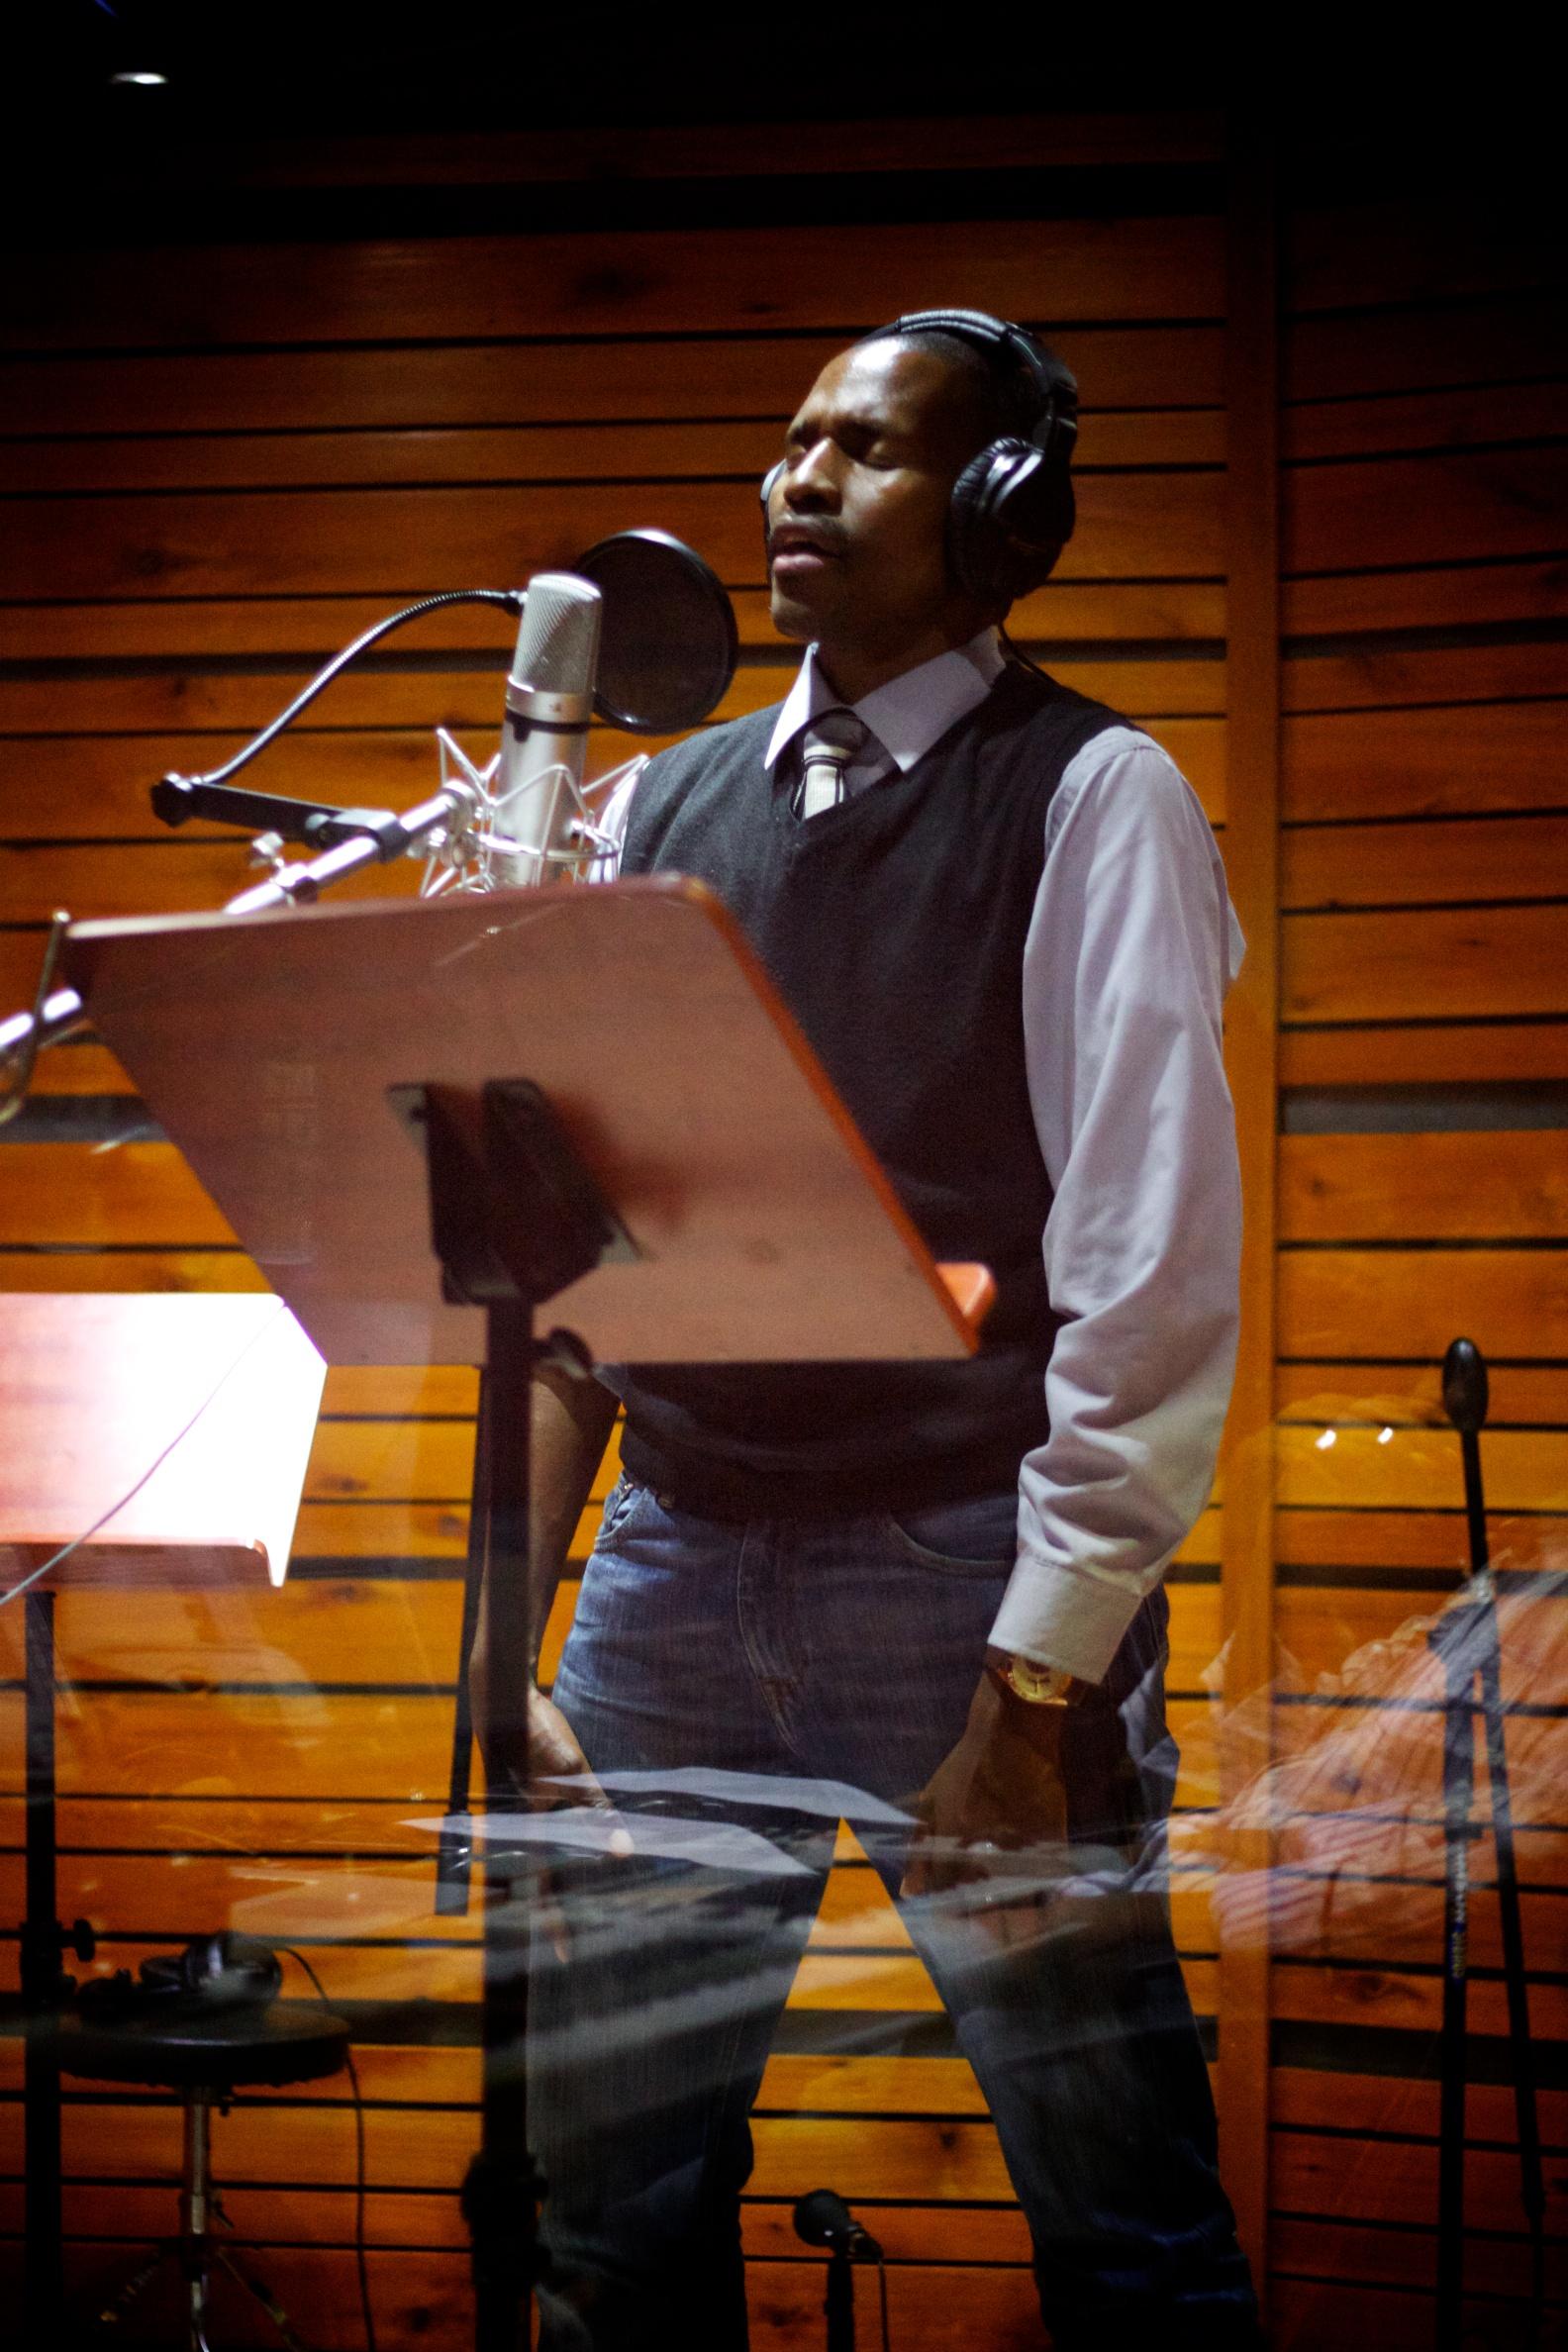 Dusty Simelane recording a track for the new Lusweti album Sitawuphumelela - Songs of Hope.jpg